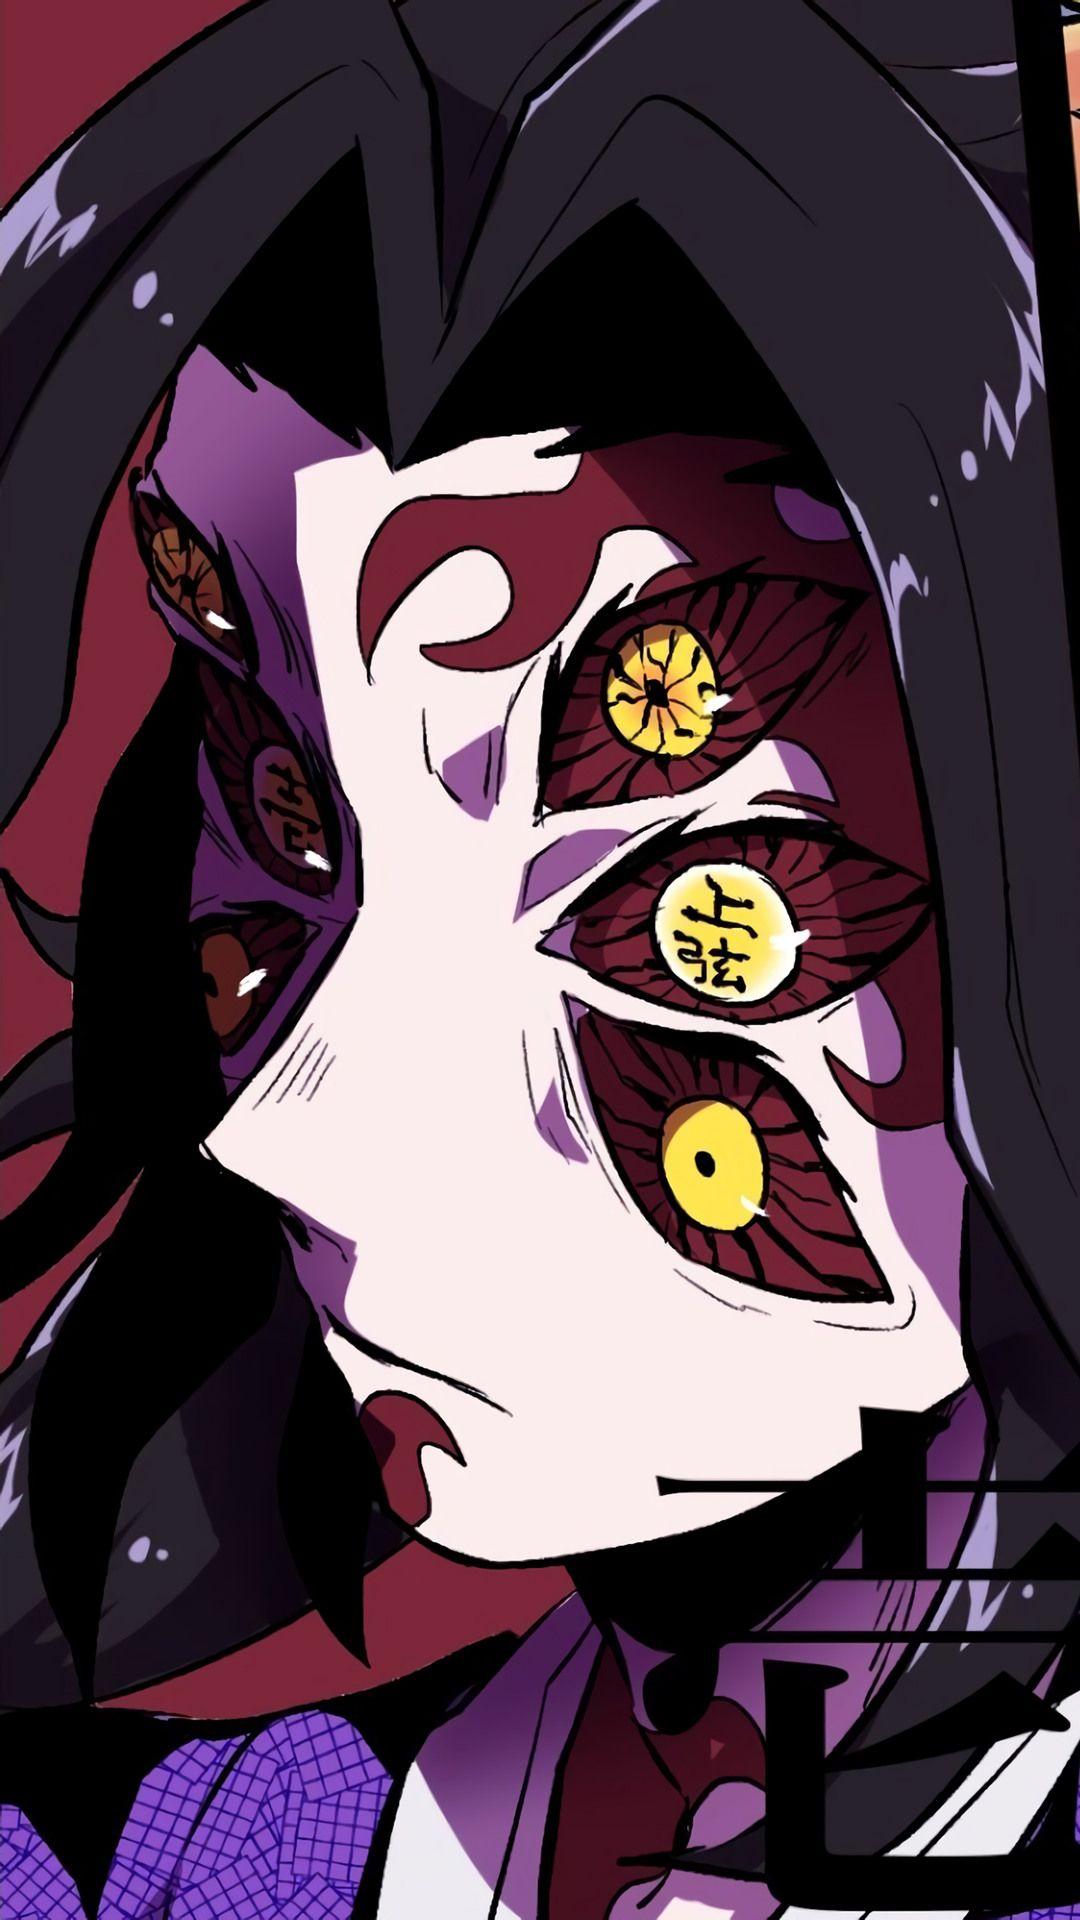 Best Demon Slayer Kokushibo HD Wallpaper 2020 в 2020 г | Демоны, Обои, Мобильные